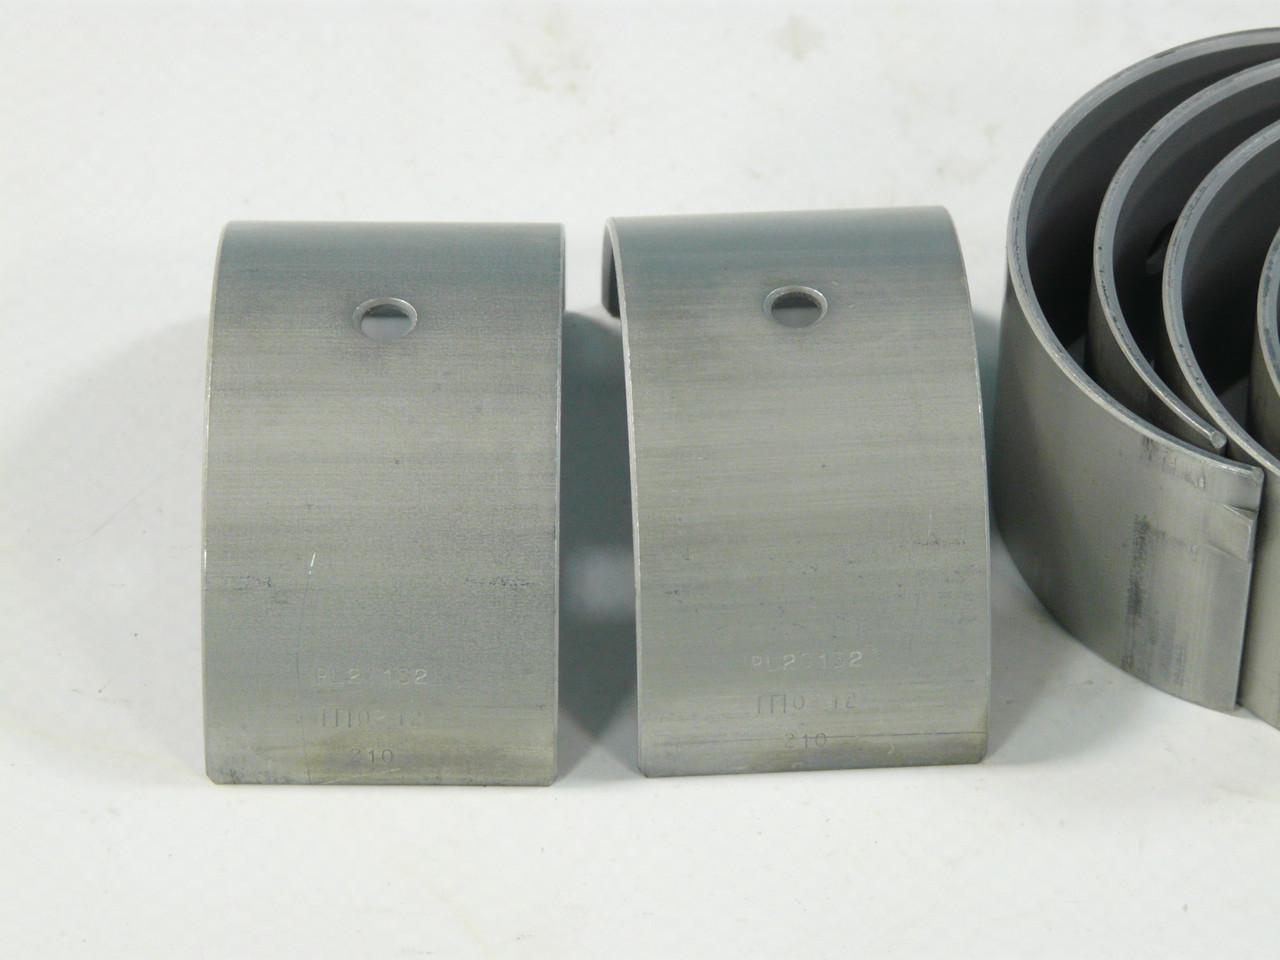 Шатунные вкладыши на двигатель Andoria SW266, Andoria SW400, Andoria 6CT107, Andoria 4CT107